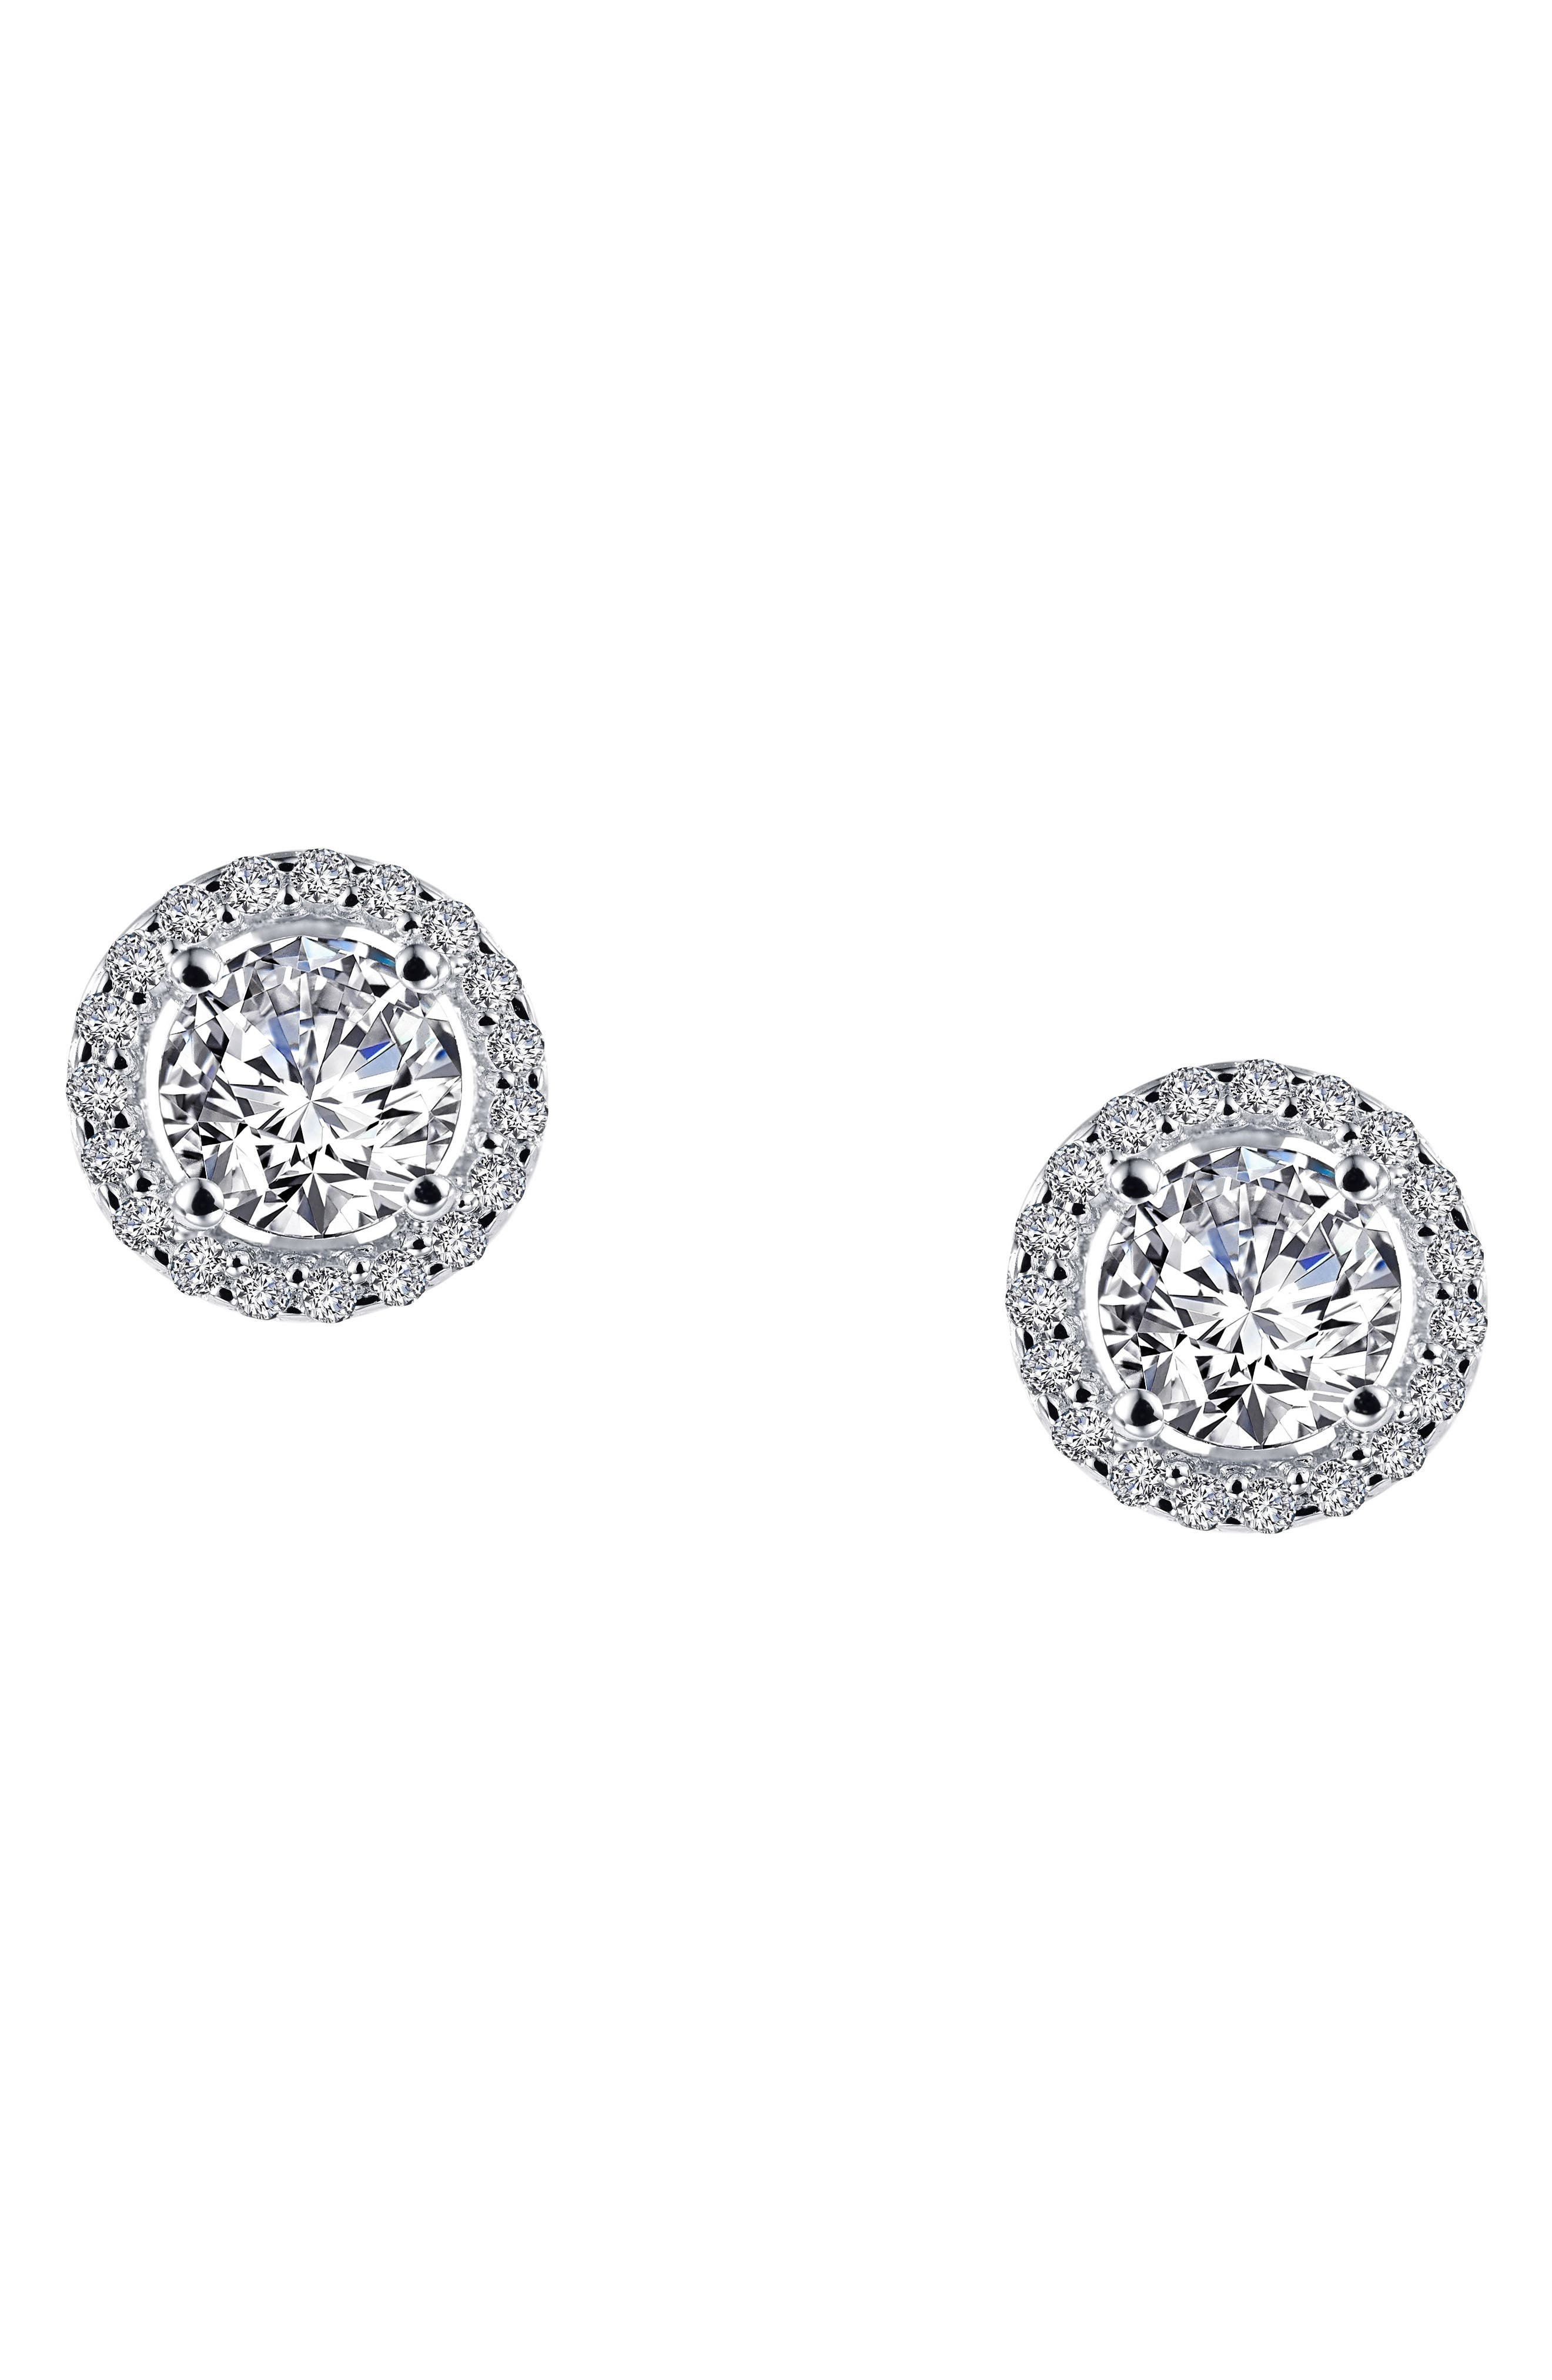 Simulated Diamond Stud Earrings,                             Alternate thumbnail 3, color,                             Silver/ Clear